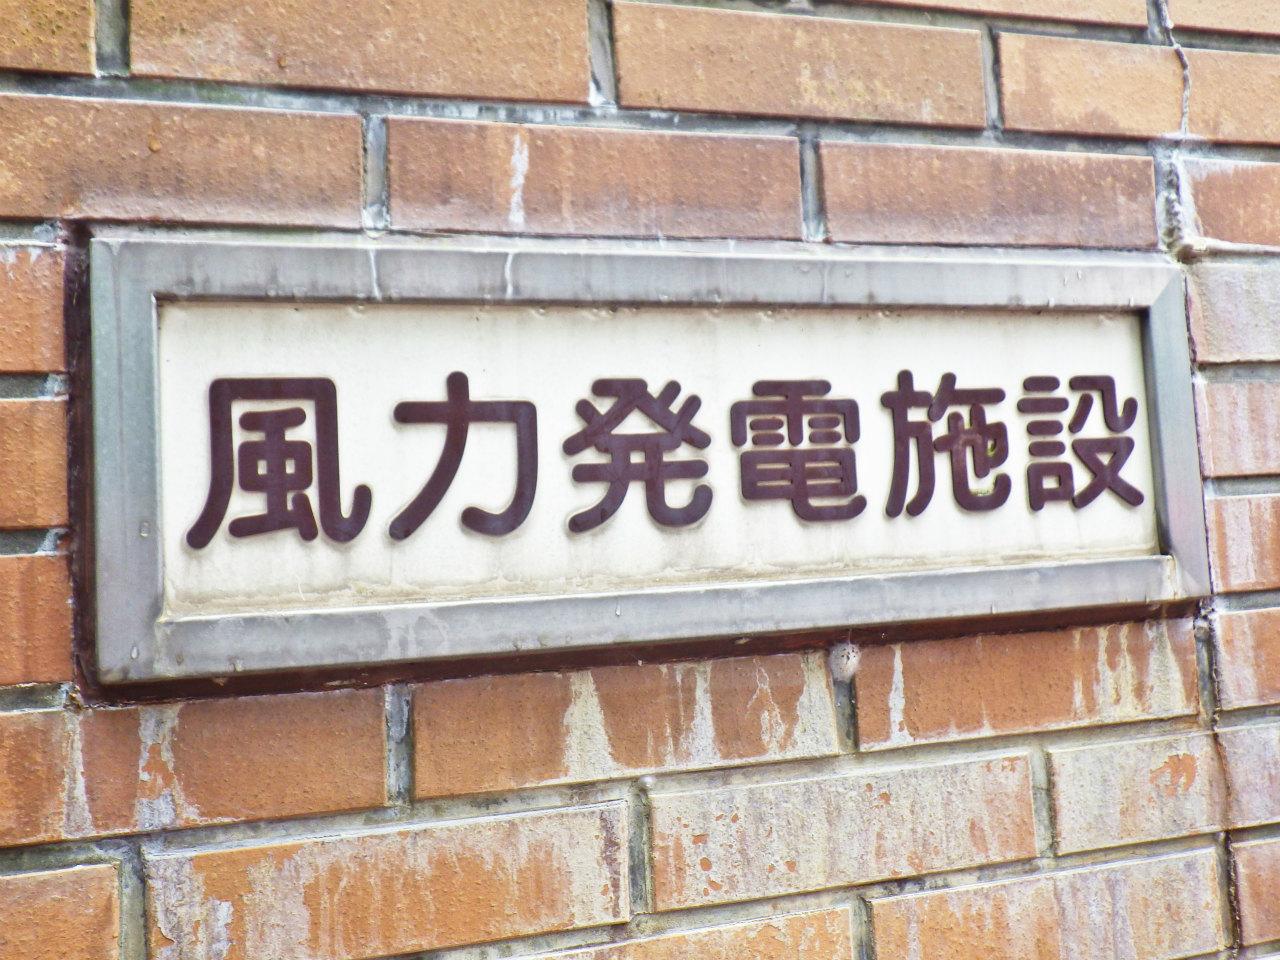 12a 旧発電施設